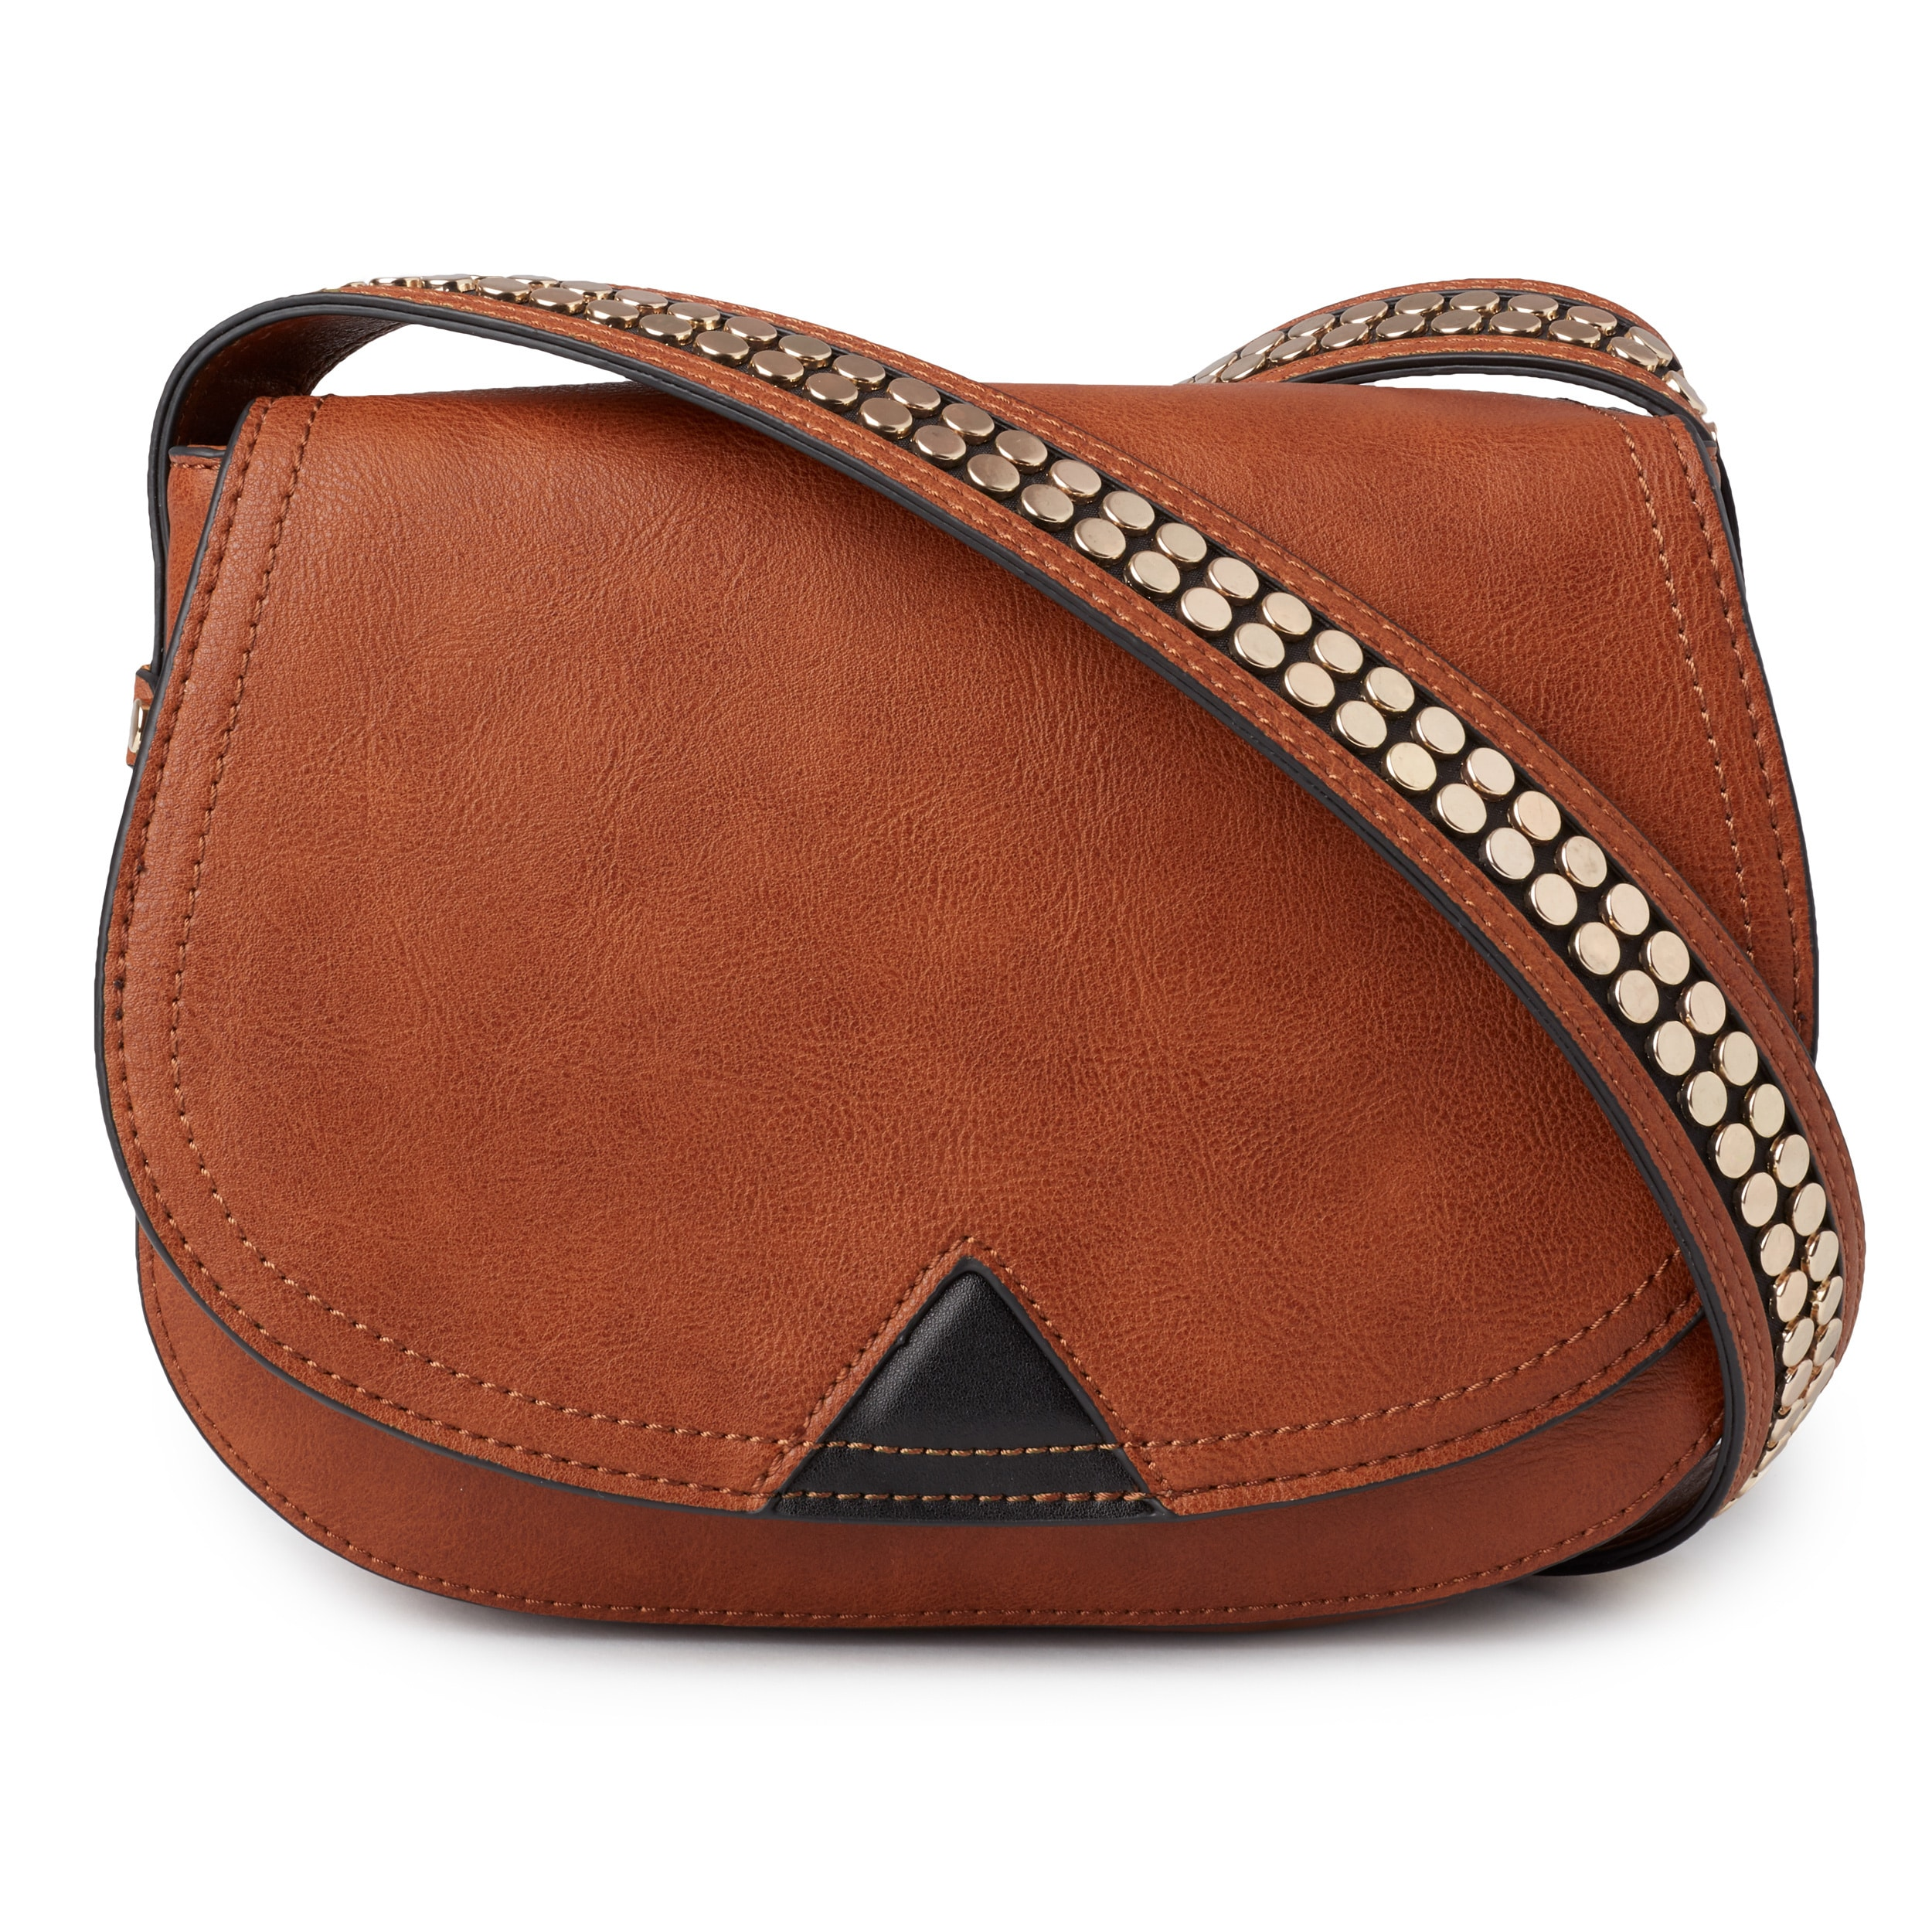 Steve Madden Potter Studded Strap Crossbody Handbag Free Shipping Today 21706554